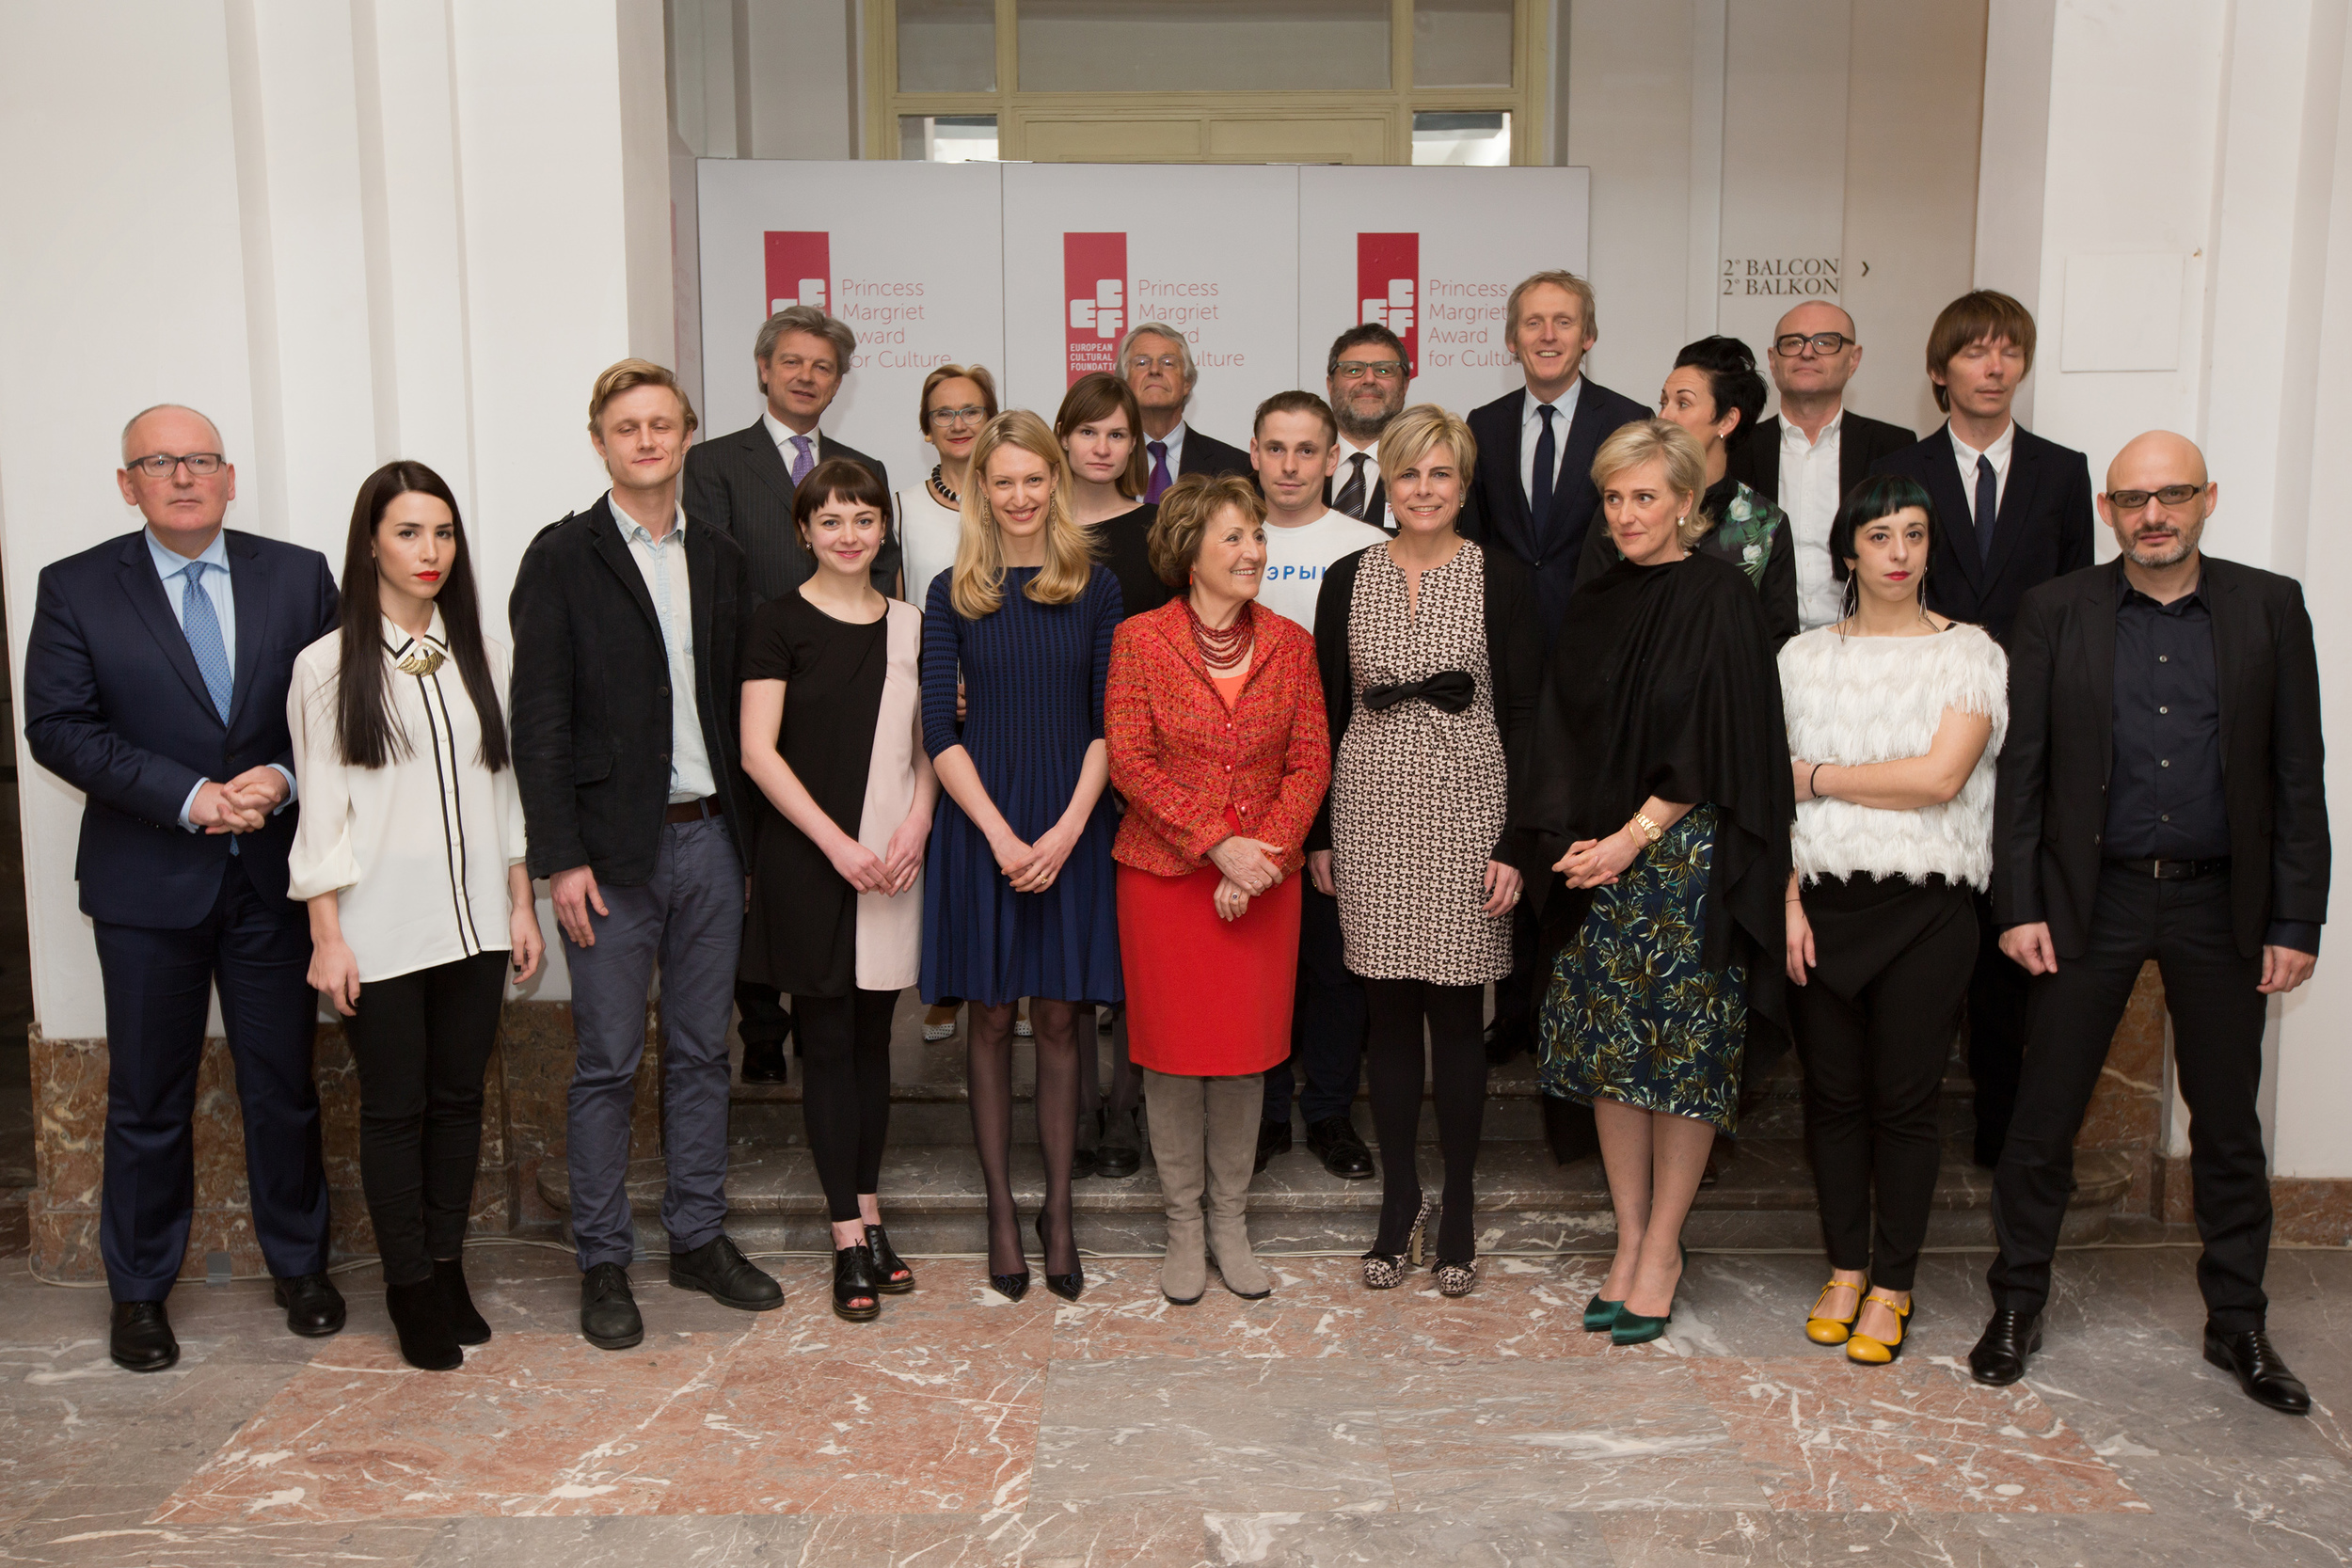 ECF Princess Margriet for Culture Award 2015. Photo by Maarten van Haaff.